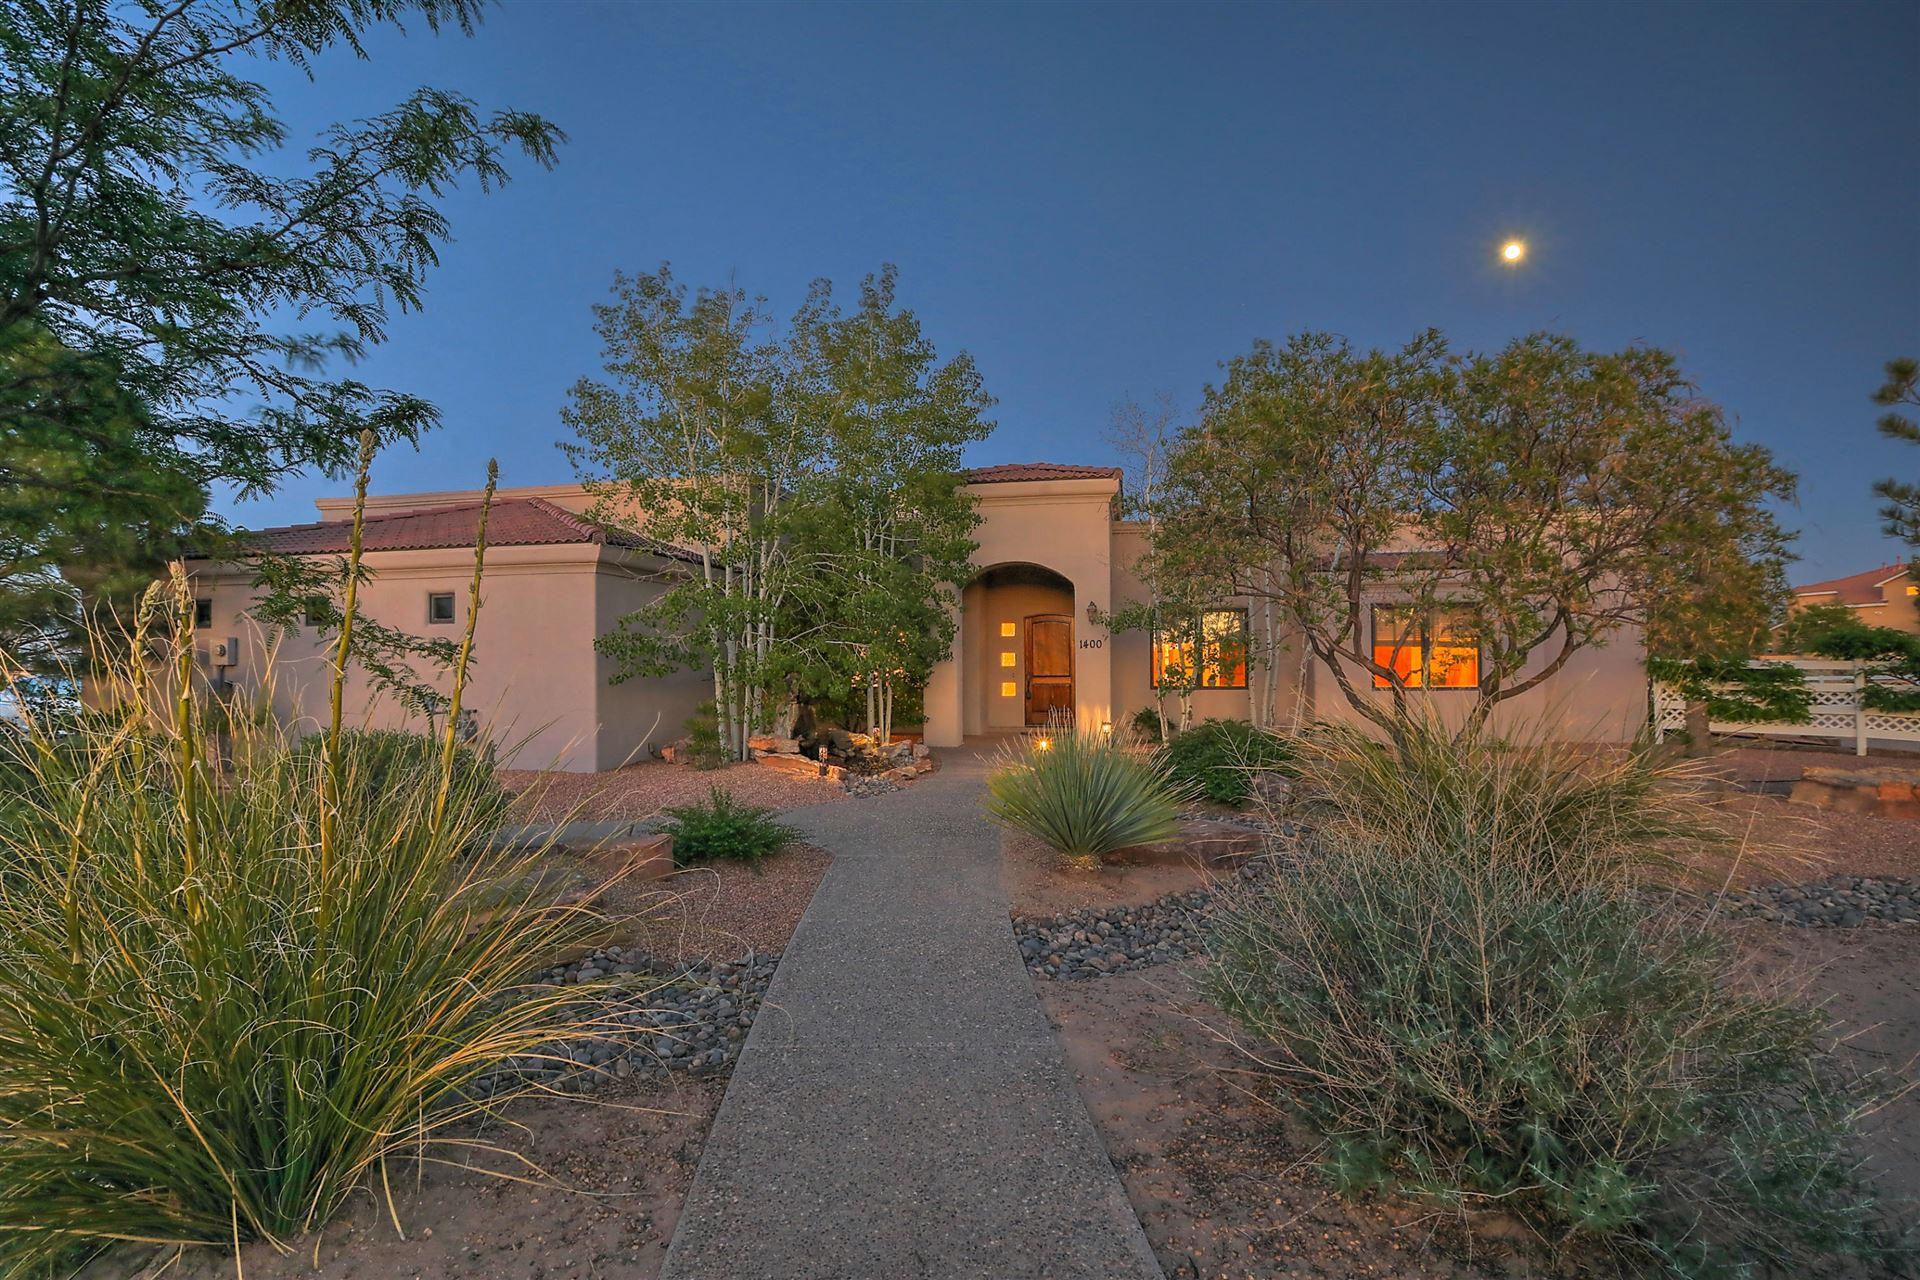 1400 ERIE Court NE, Rio Rancho, NM 87144 - #: 993477